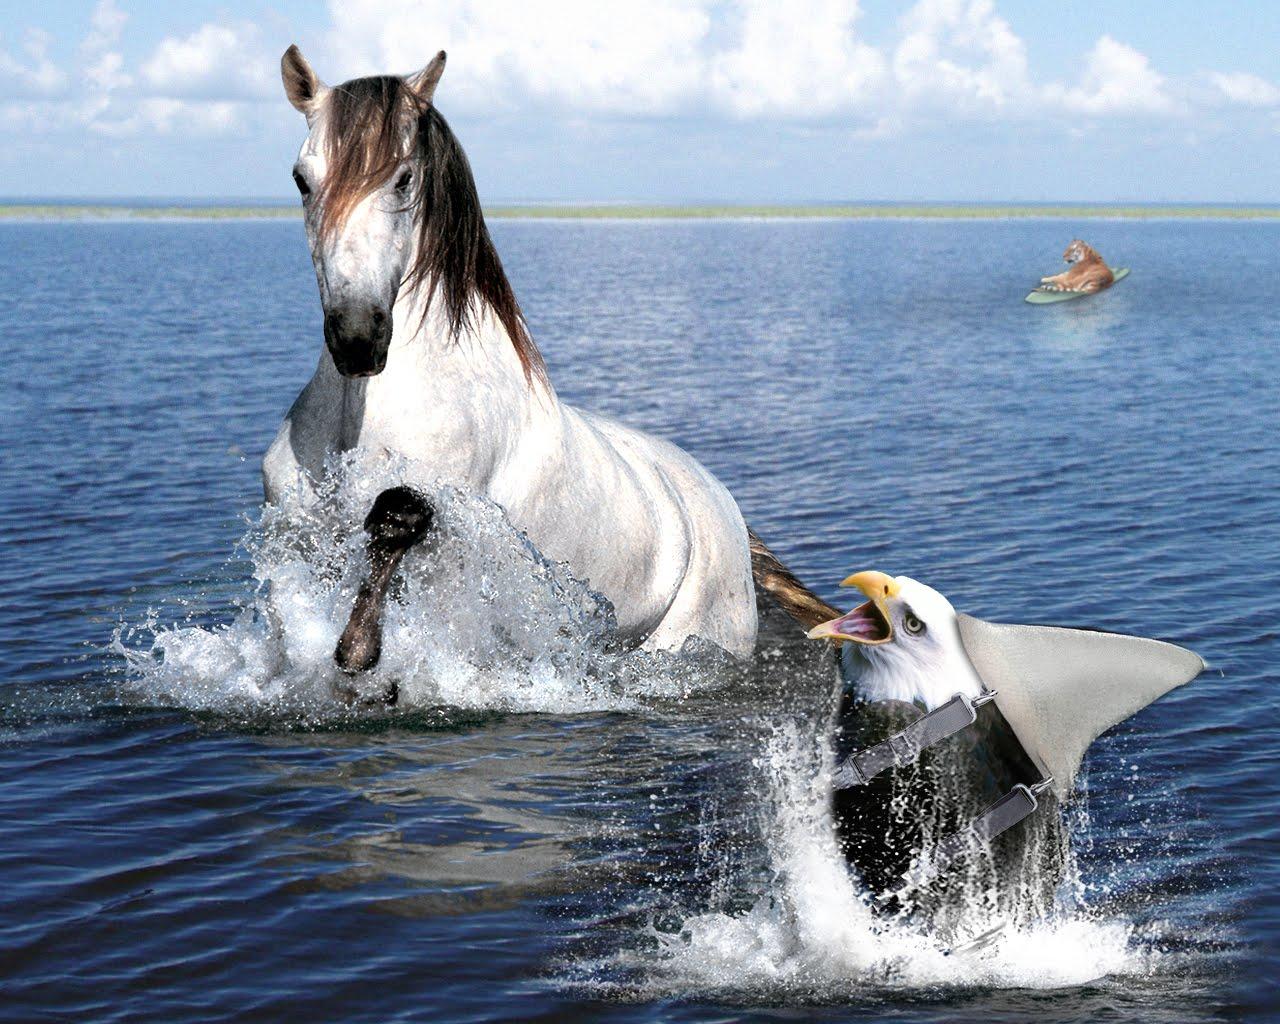 Shark Mixed with Horse